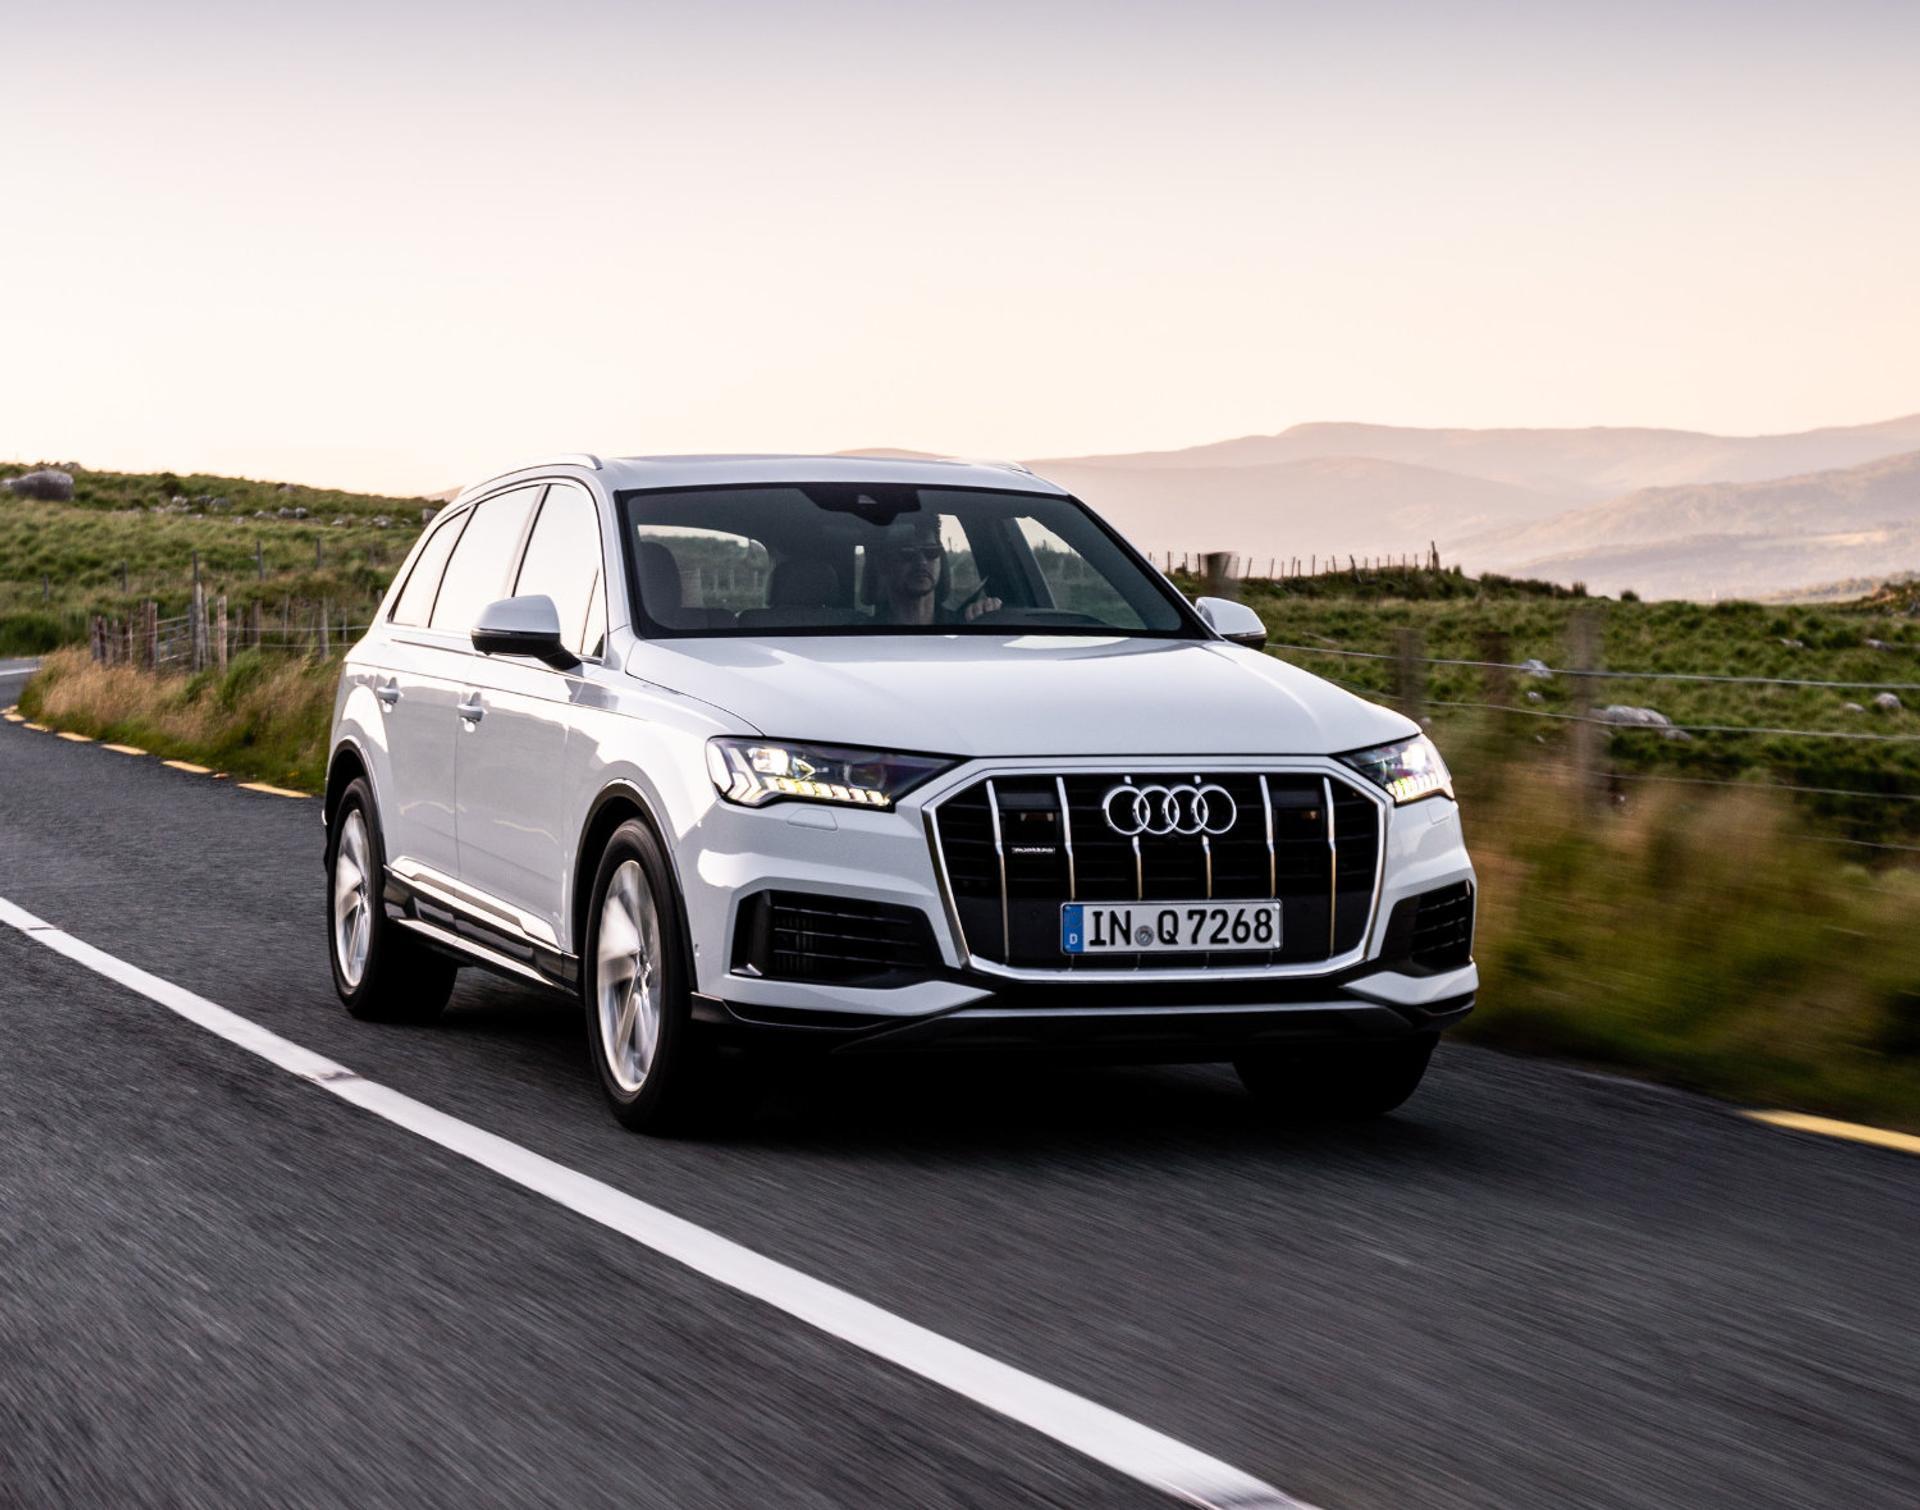 2021 Audi Q7 Premium 45TFSI